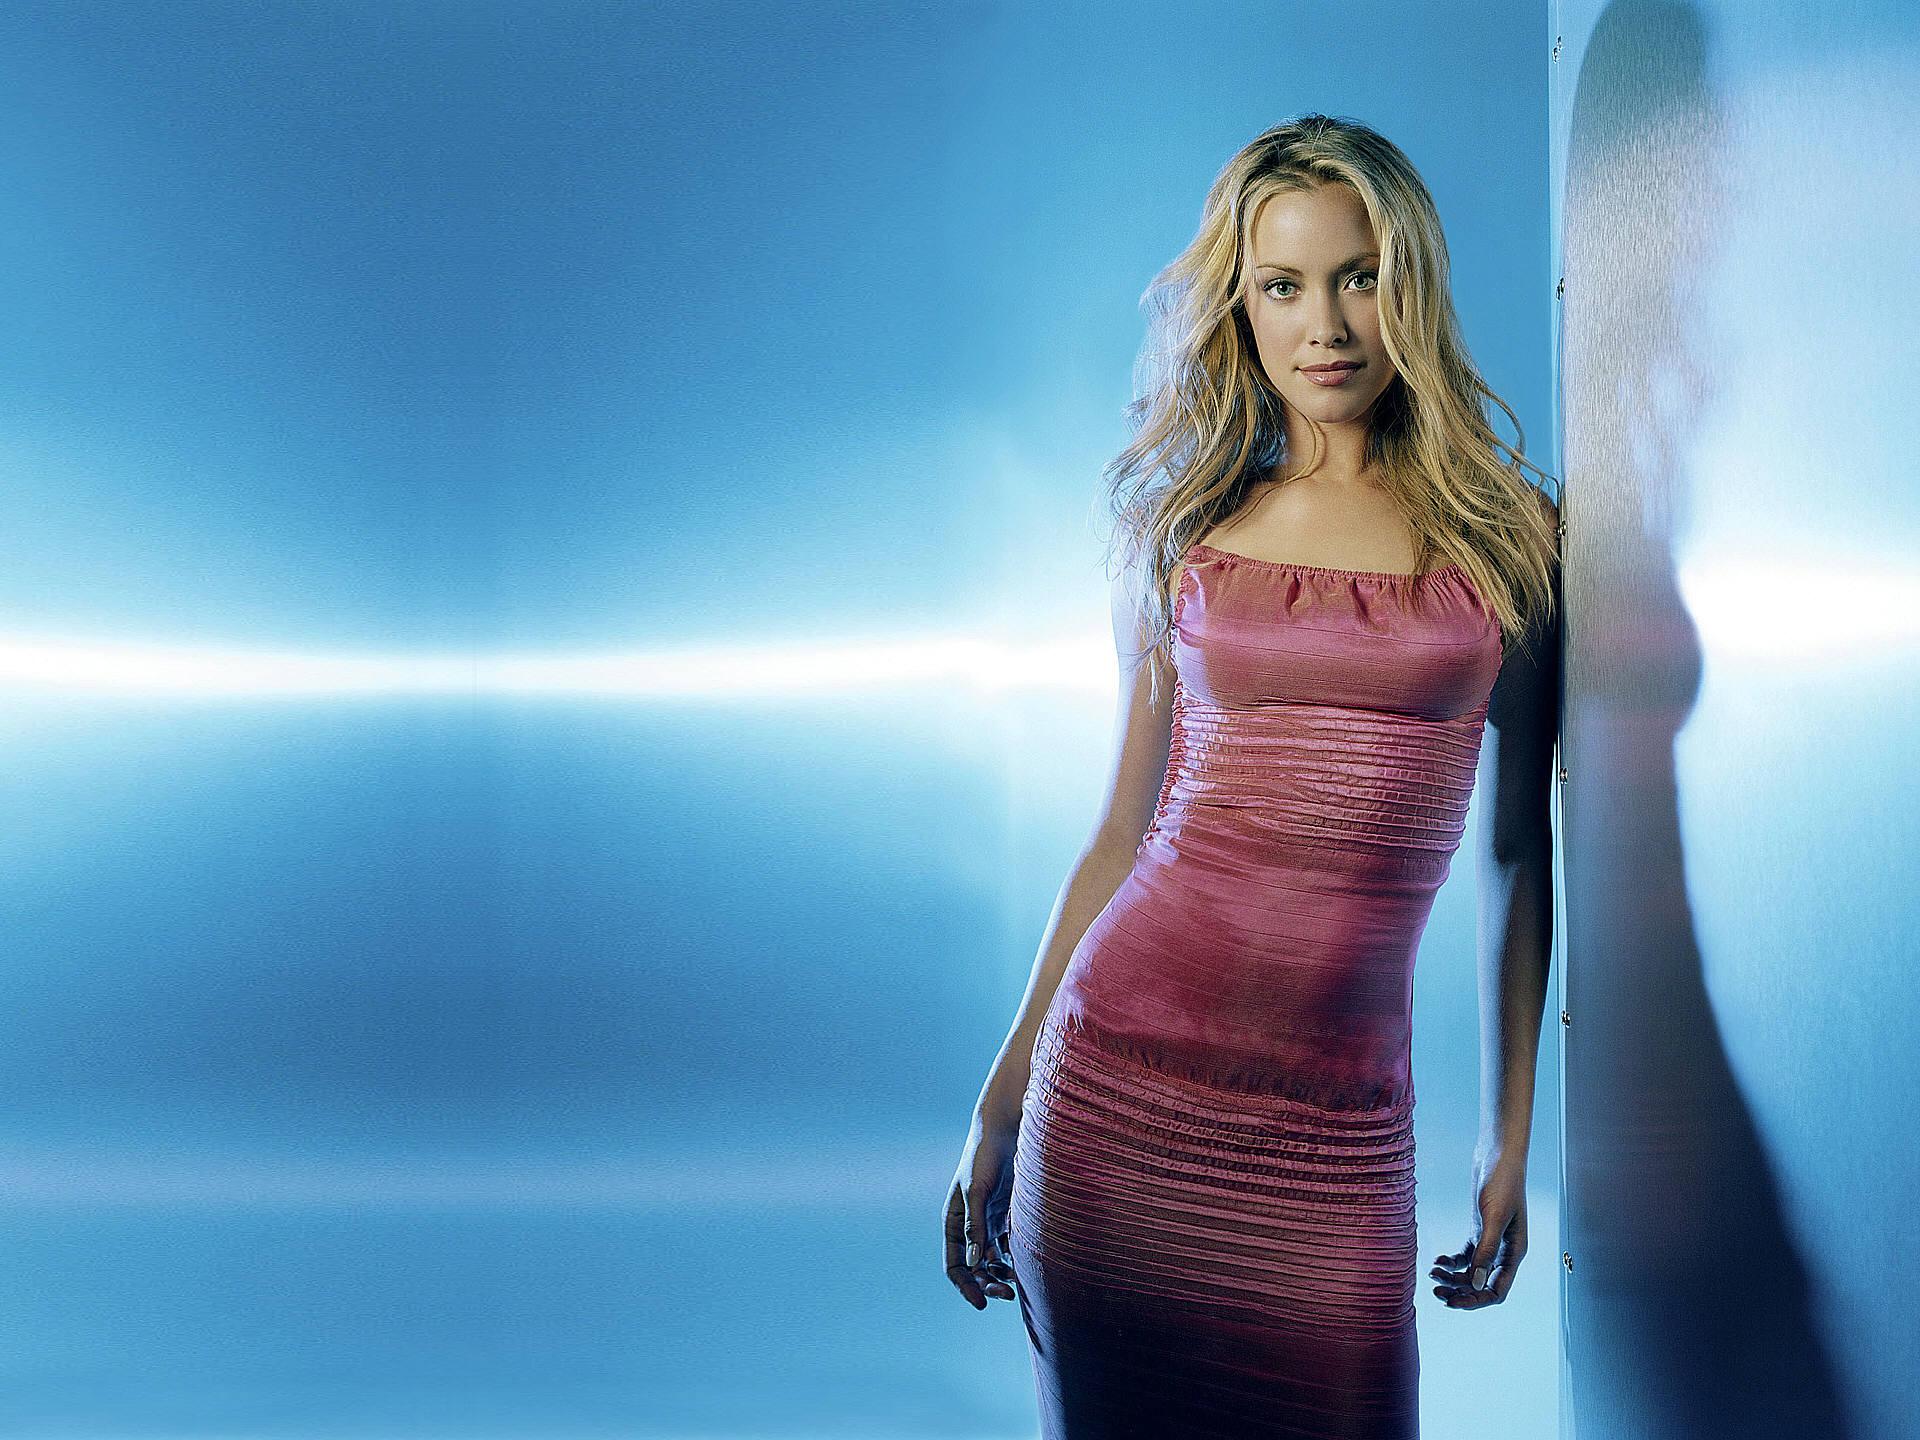 Kristanna Loken Hot Photos HD 1080p - YouTube